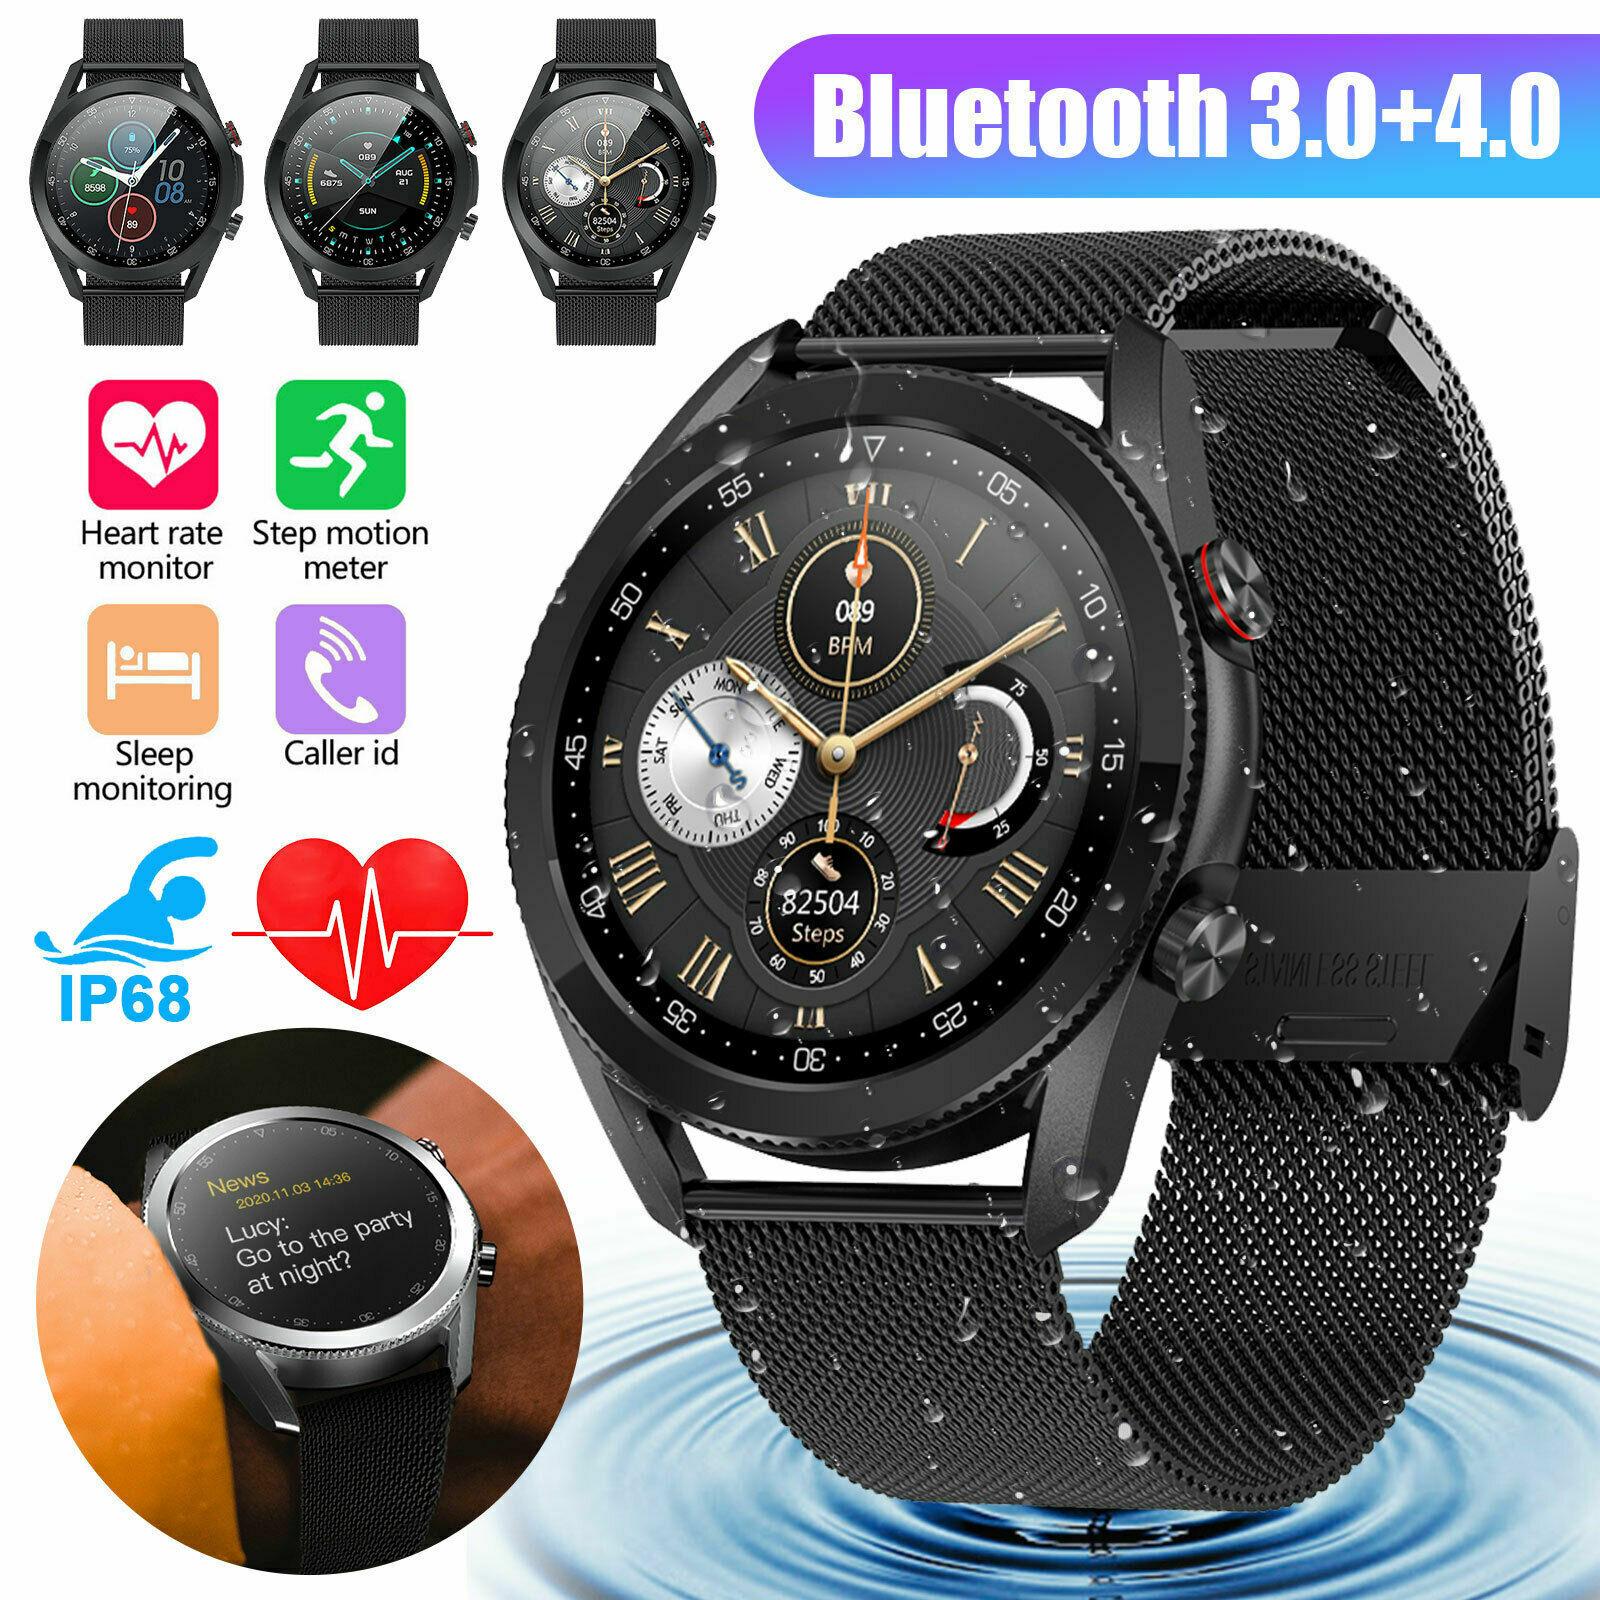 Bluetooth Smart Watch Calls ECG Blood Oxygen Heart Rate Monitor IP68 Waterproof blood bluetooth calls ecg heart monitor oxygen rate smart watch